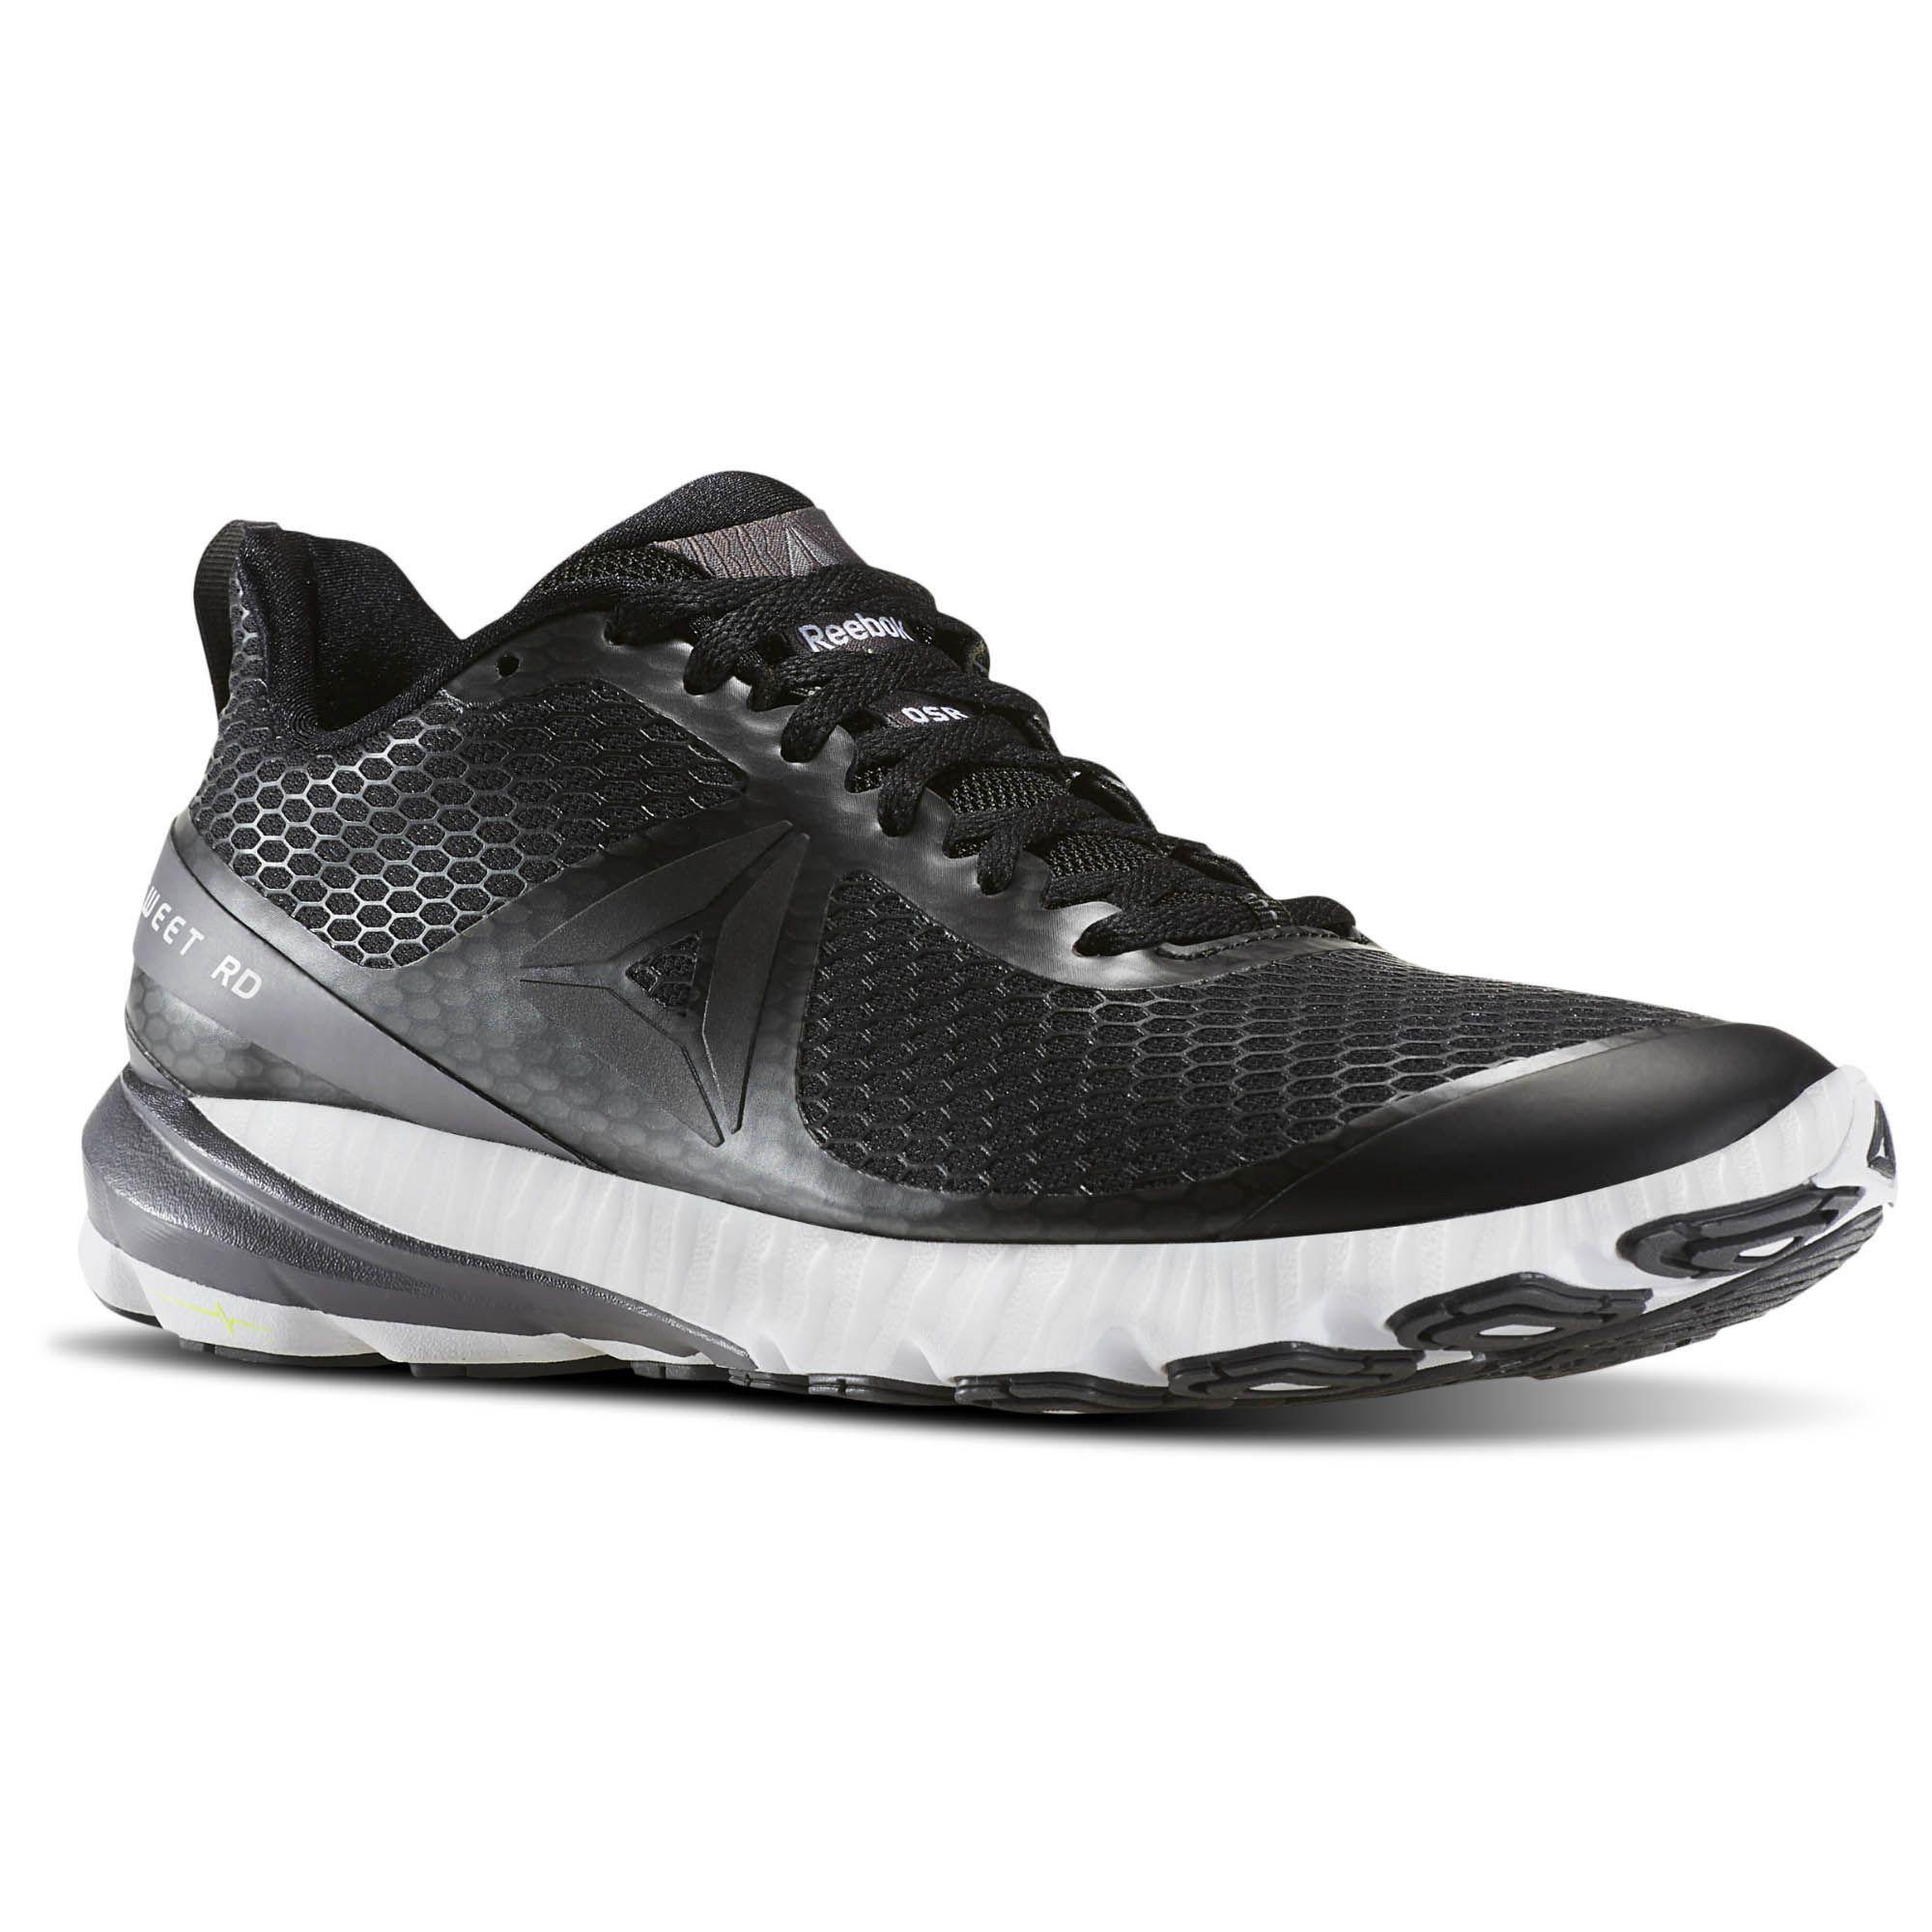 3786bd4a REEBOK OSR Sweet Road. #reebok #shoes # | Reebok Men | Reebok ...